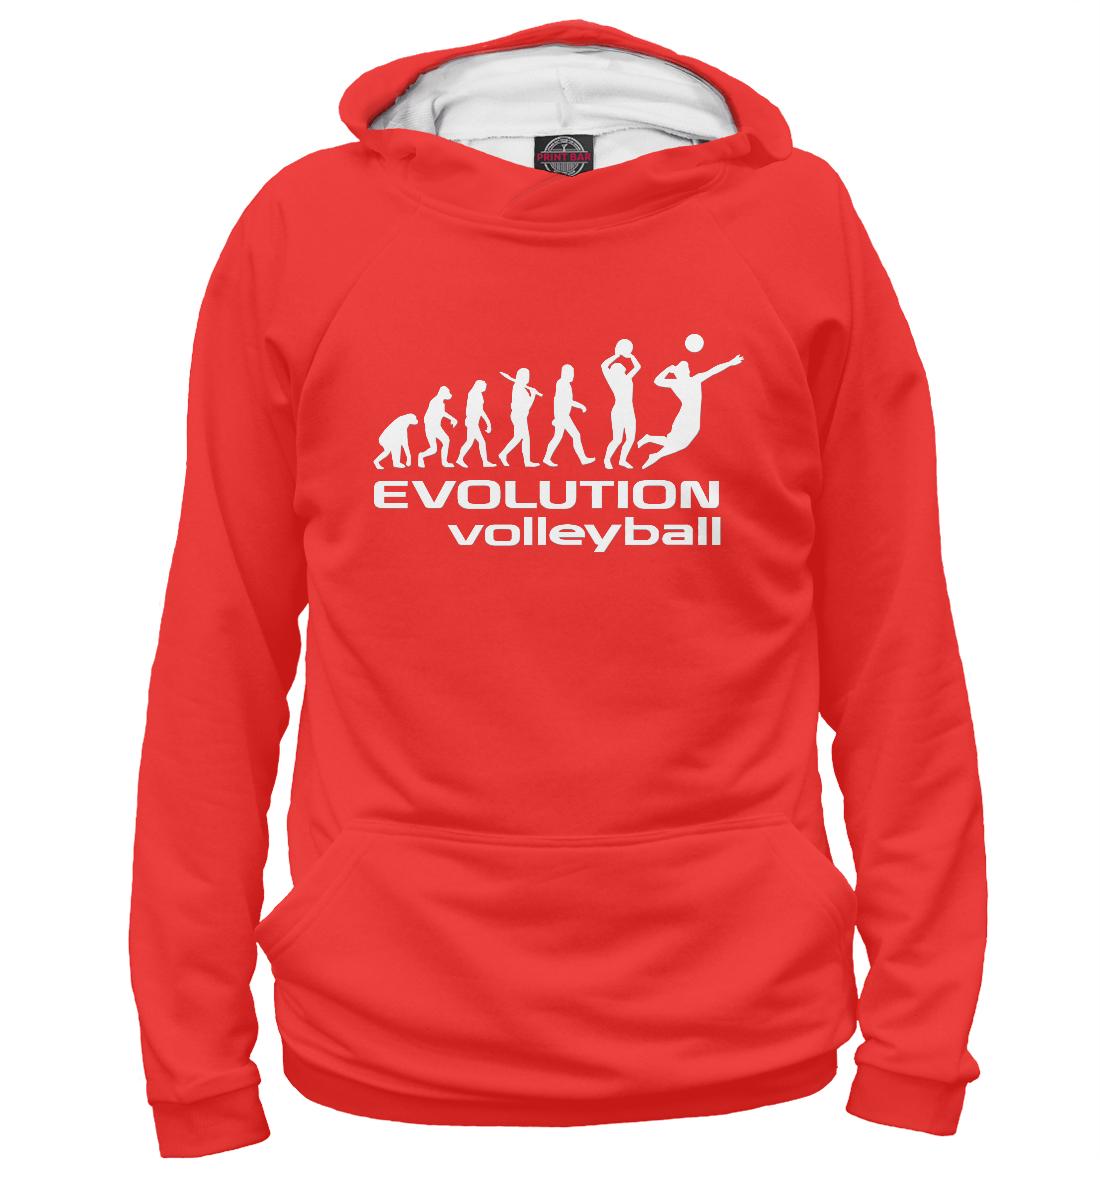 Evolution (volleyball), Printbar, Худи, VLB-532402-hud-1  - купить со скидкой